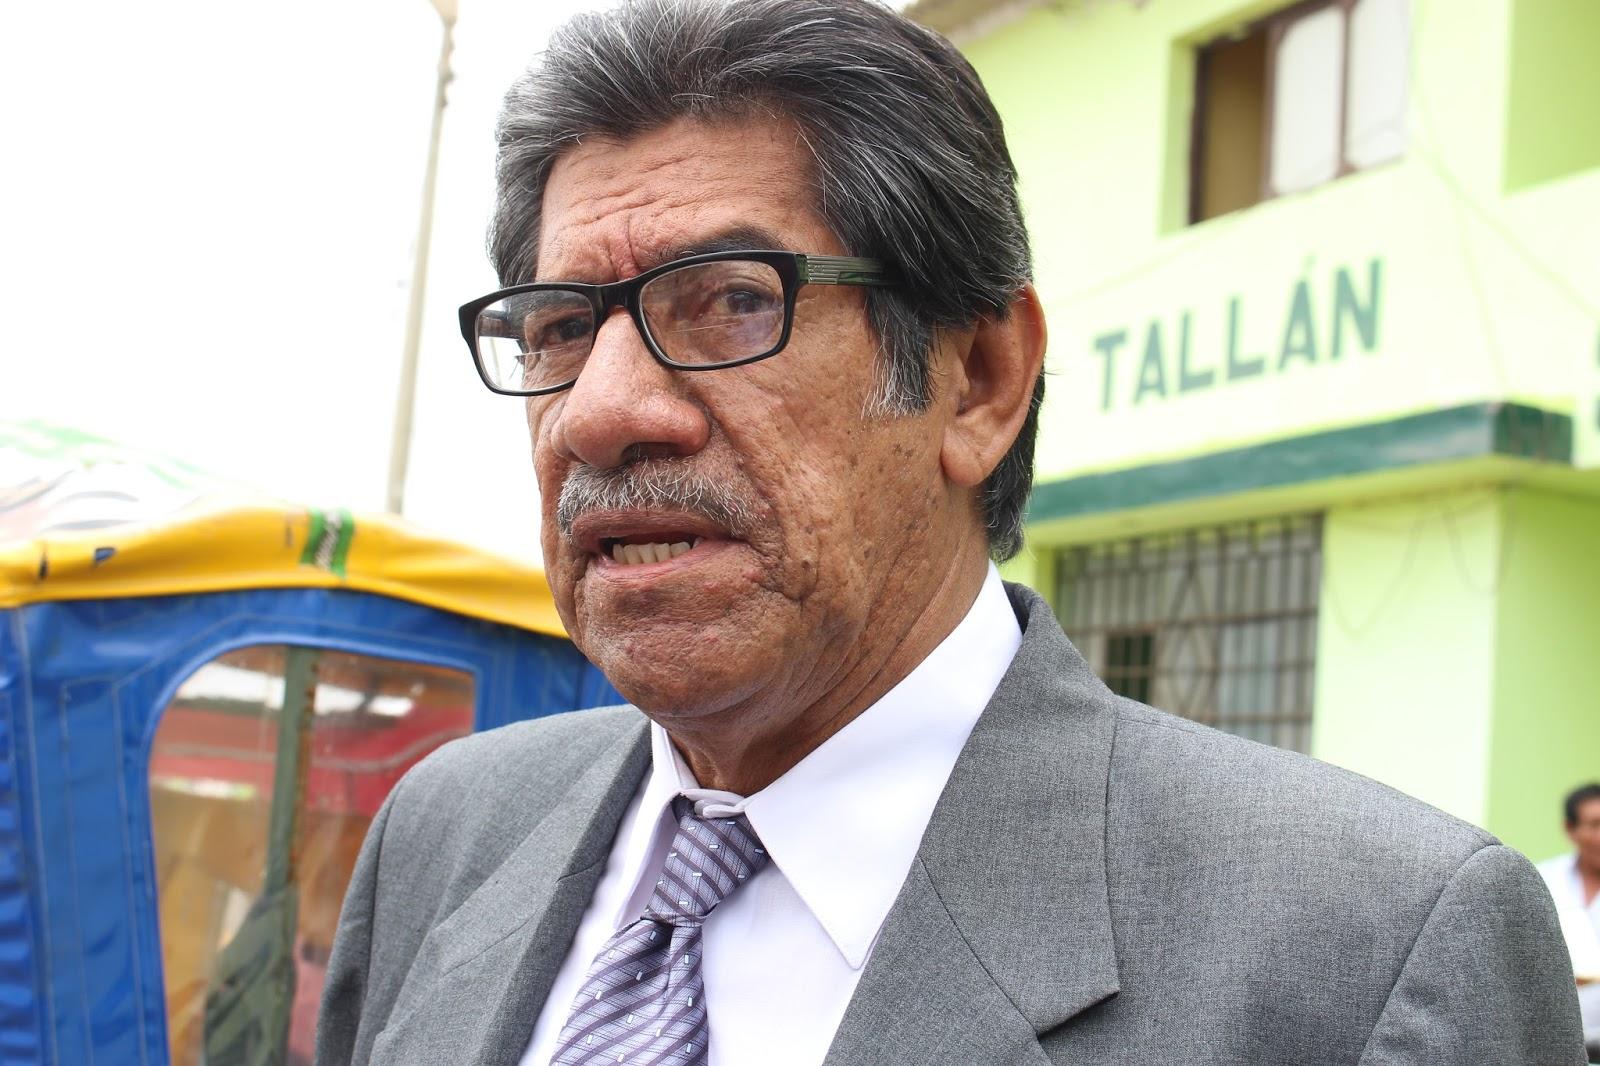 El titular de Agricultura en Piura, Mario Laberry, indicó que pedirá apoyo al Gobierno central para reactivar este cultivo.